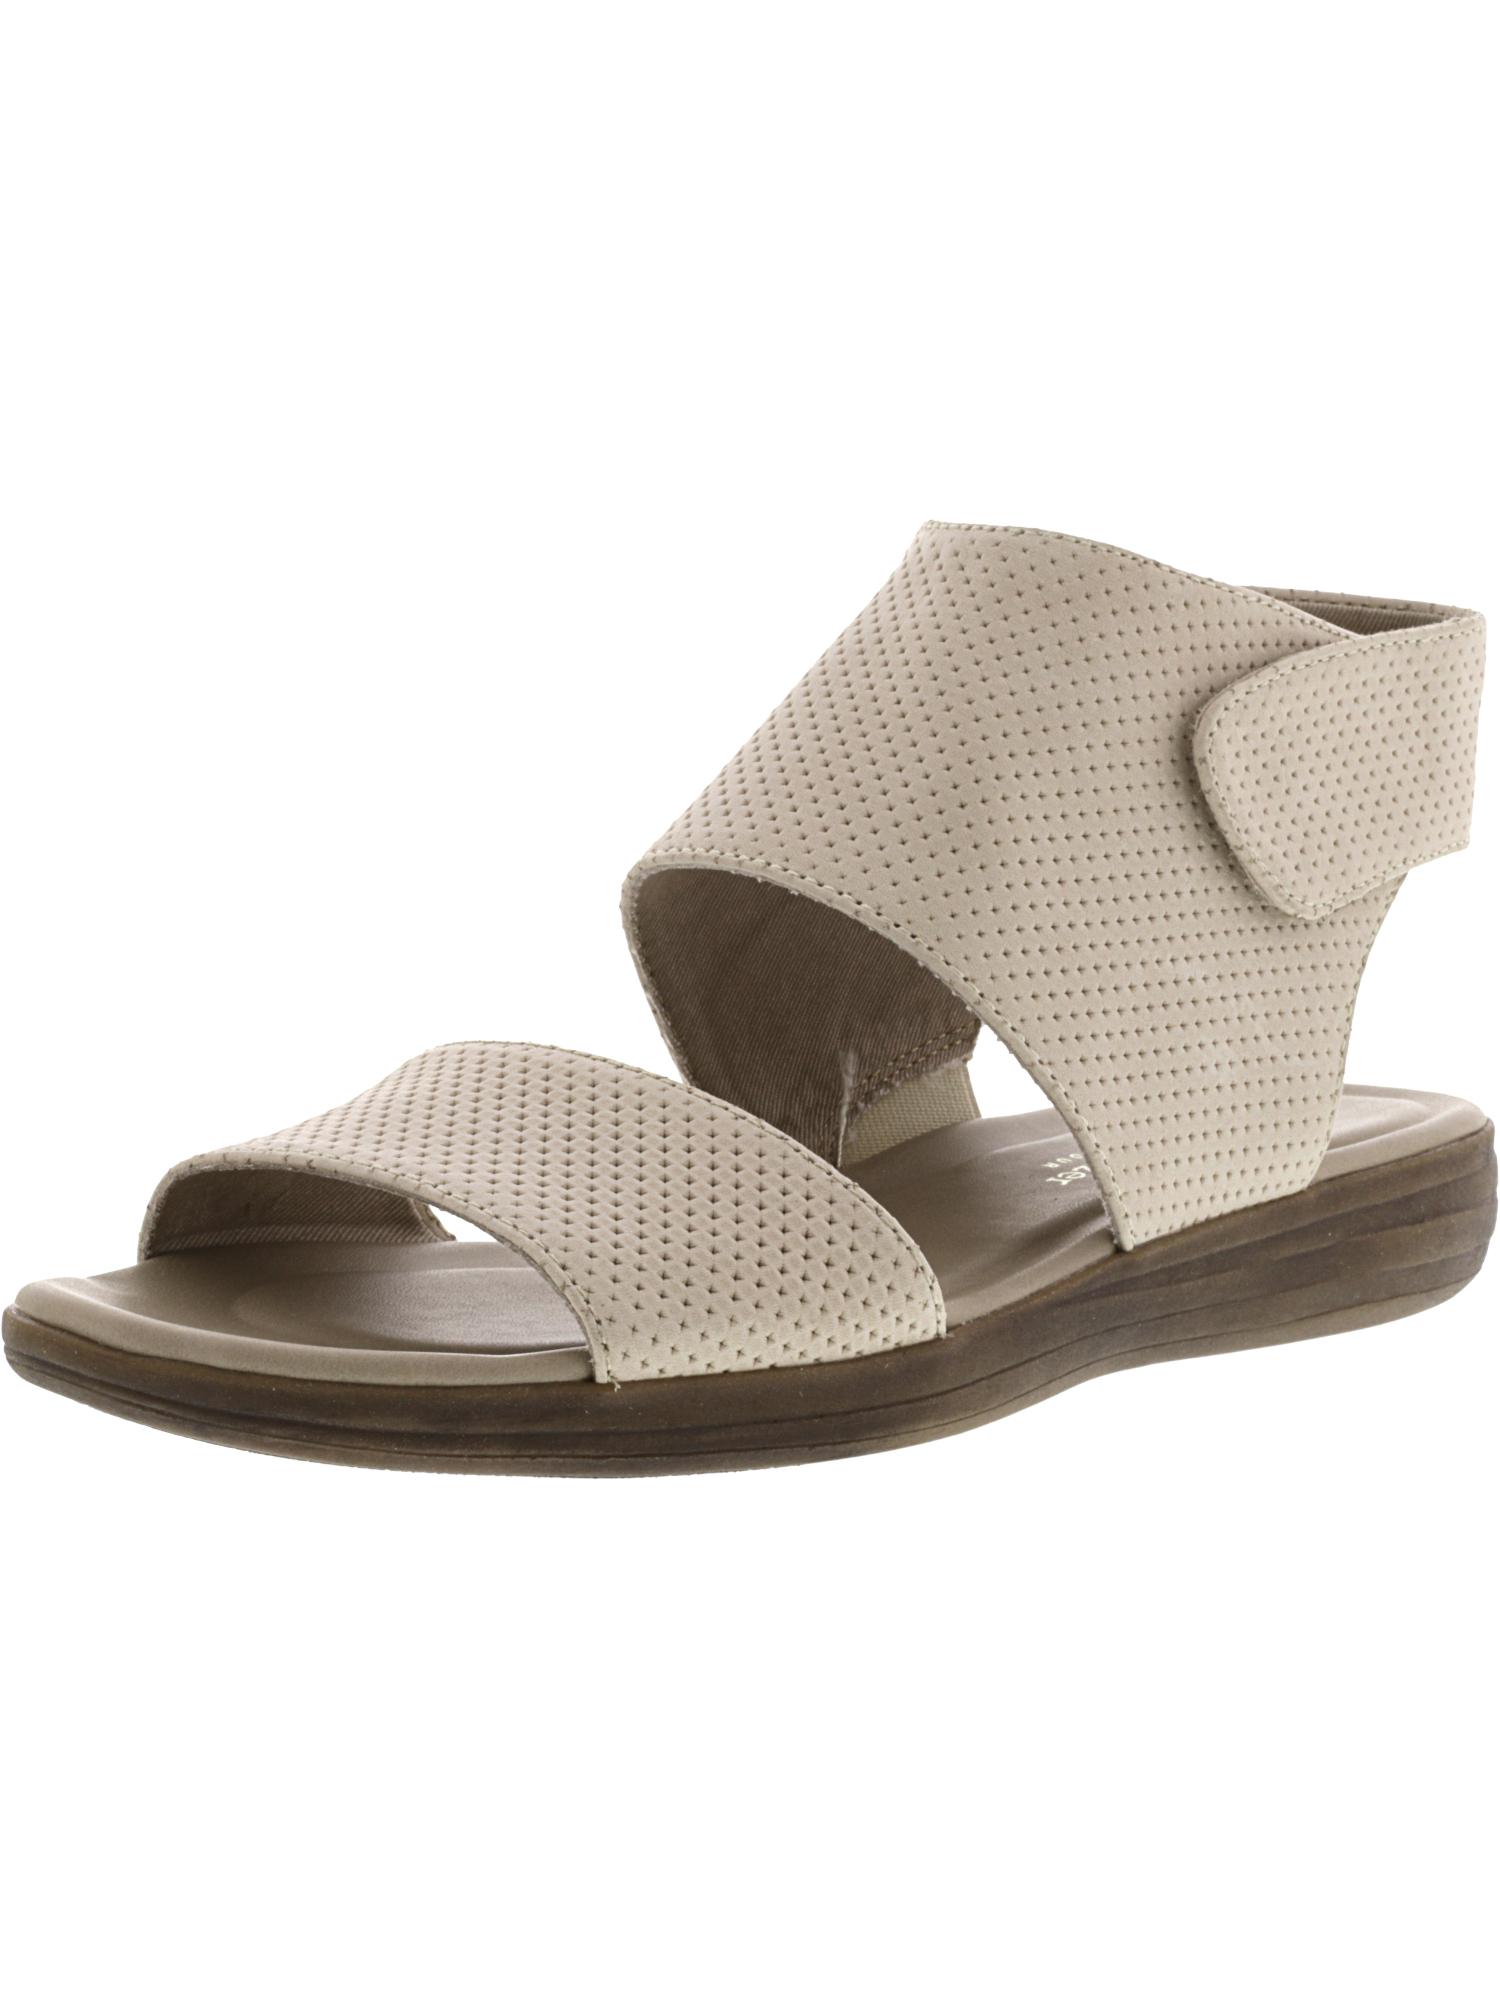 6a619fdc4c2d Naturalizer FAE Flat Comfort Sandals 965 Porcelain Leather 9 W US